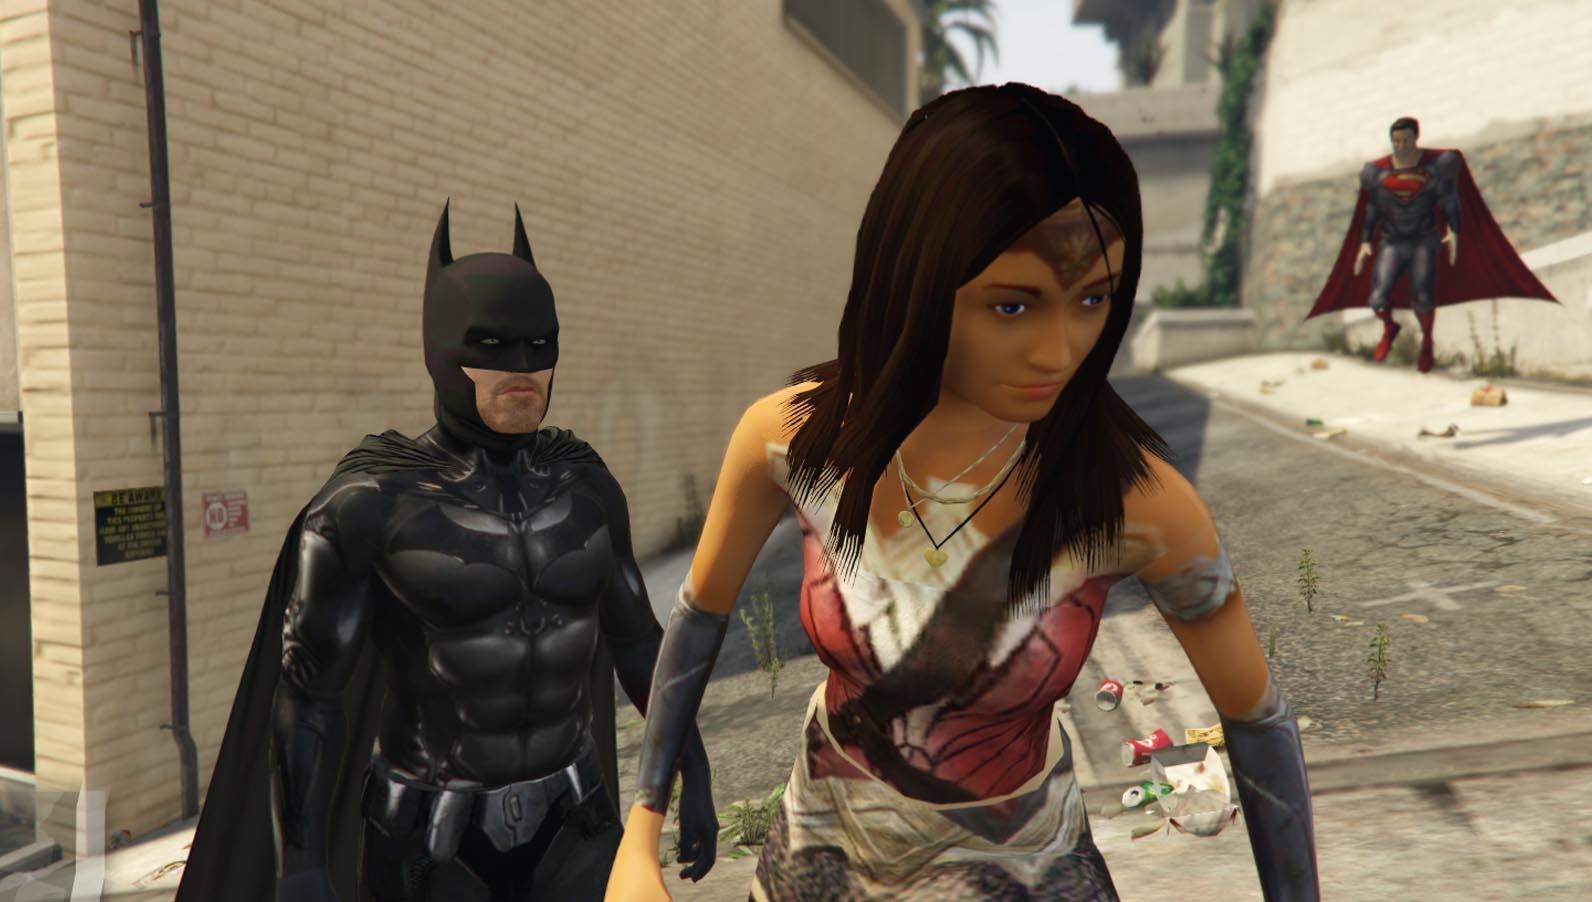 Wonder Woman Batman V Superman - Gta5-Modscom-4289